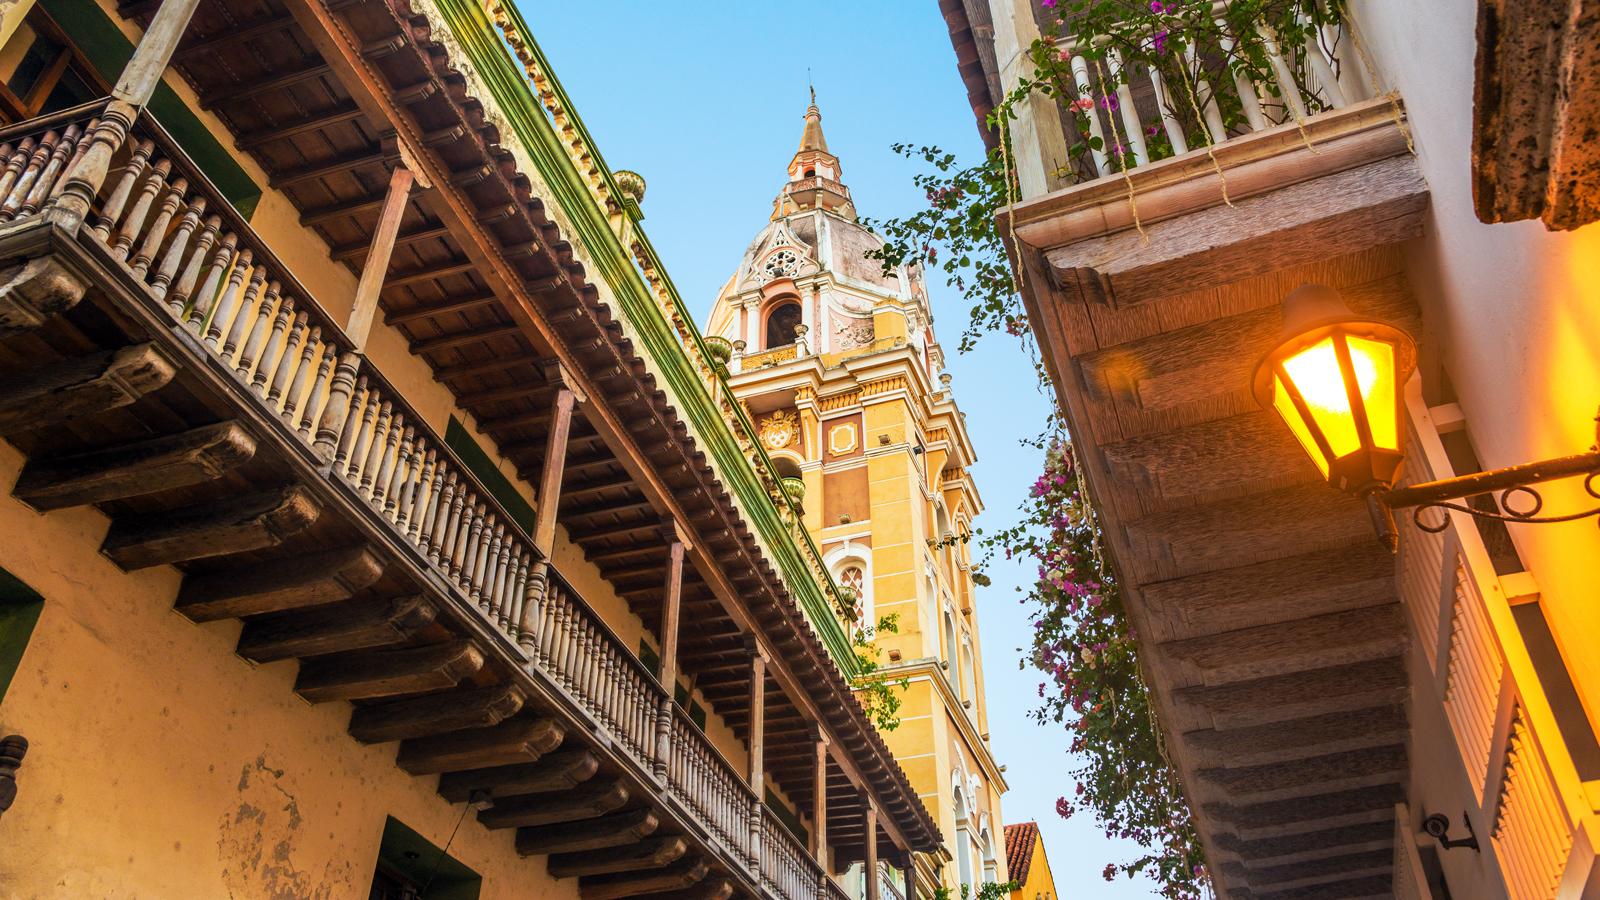 cartagena-church-city-large-street